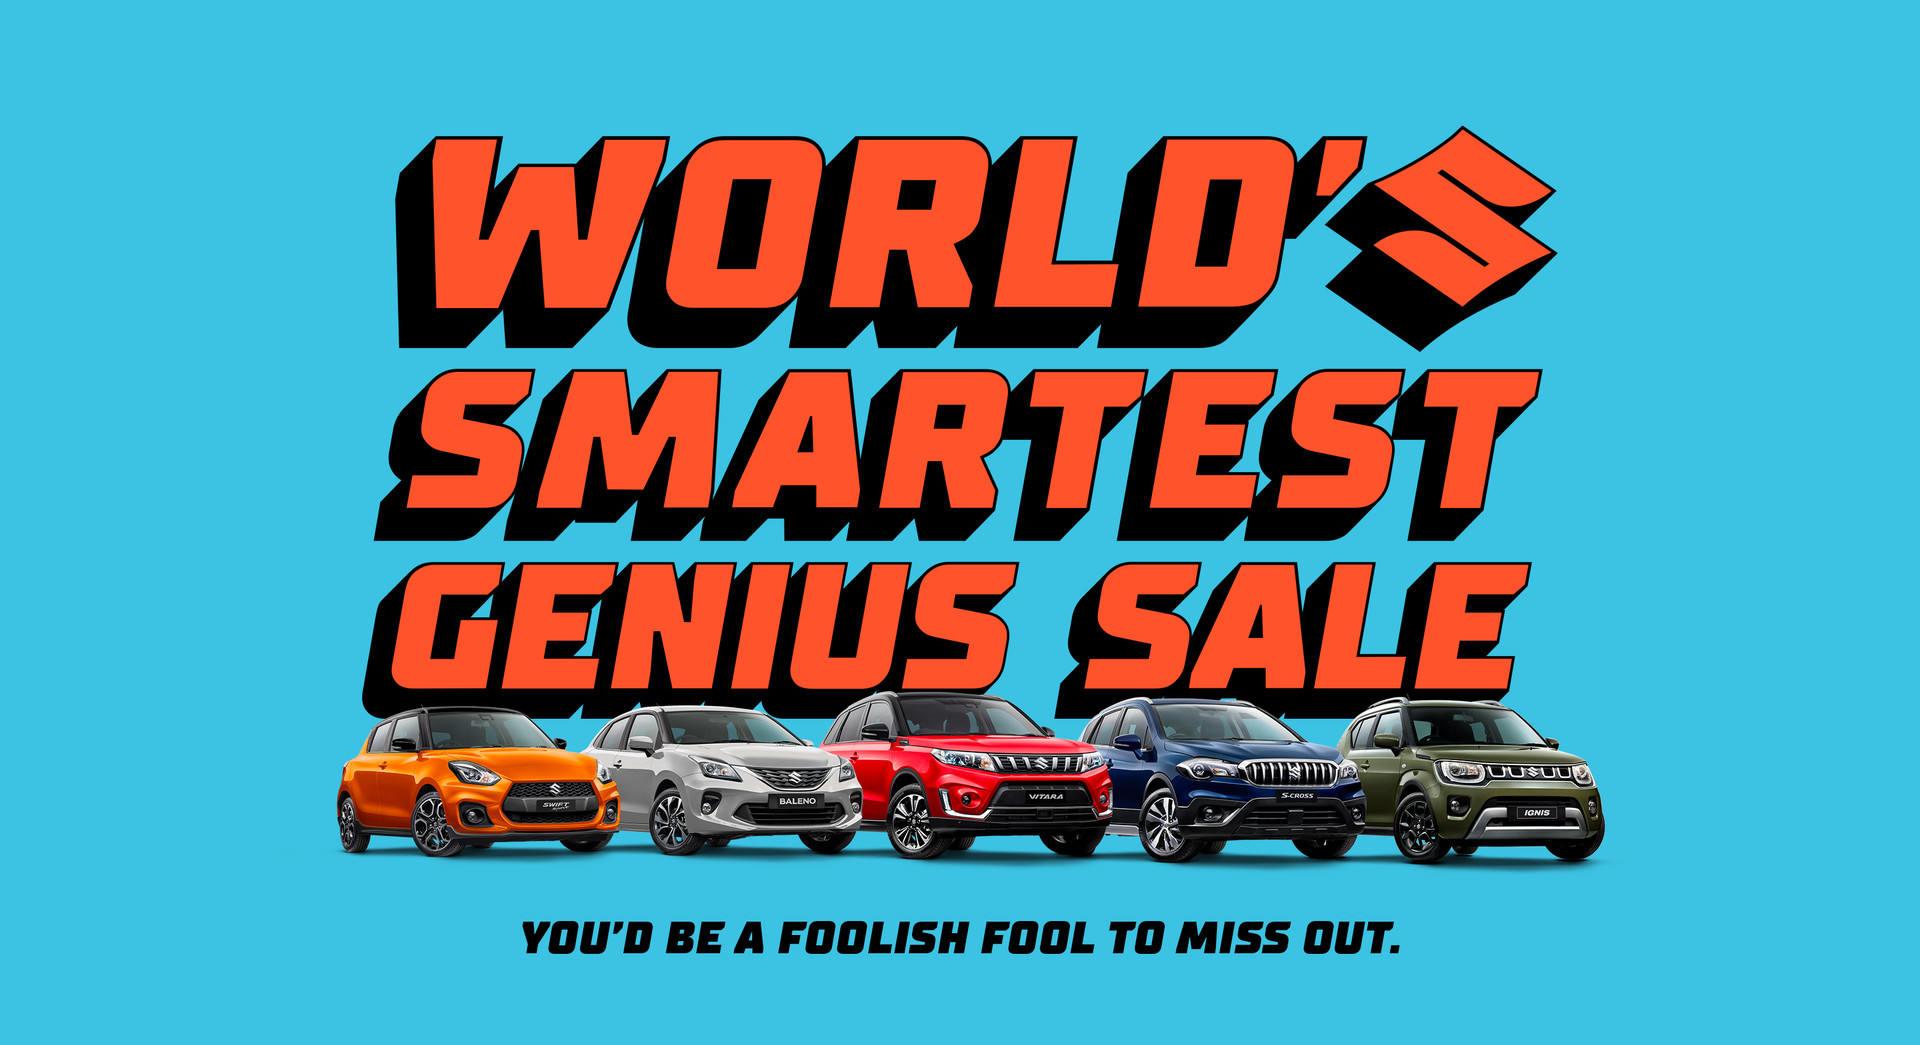 Suzuki Cars National Offers June 2021